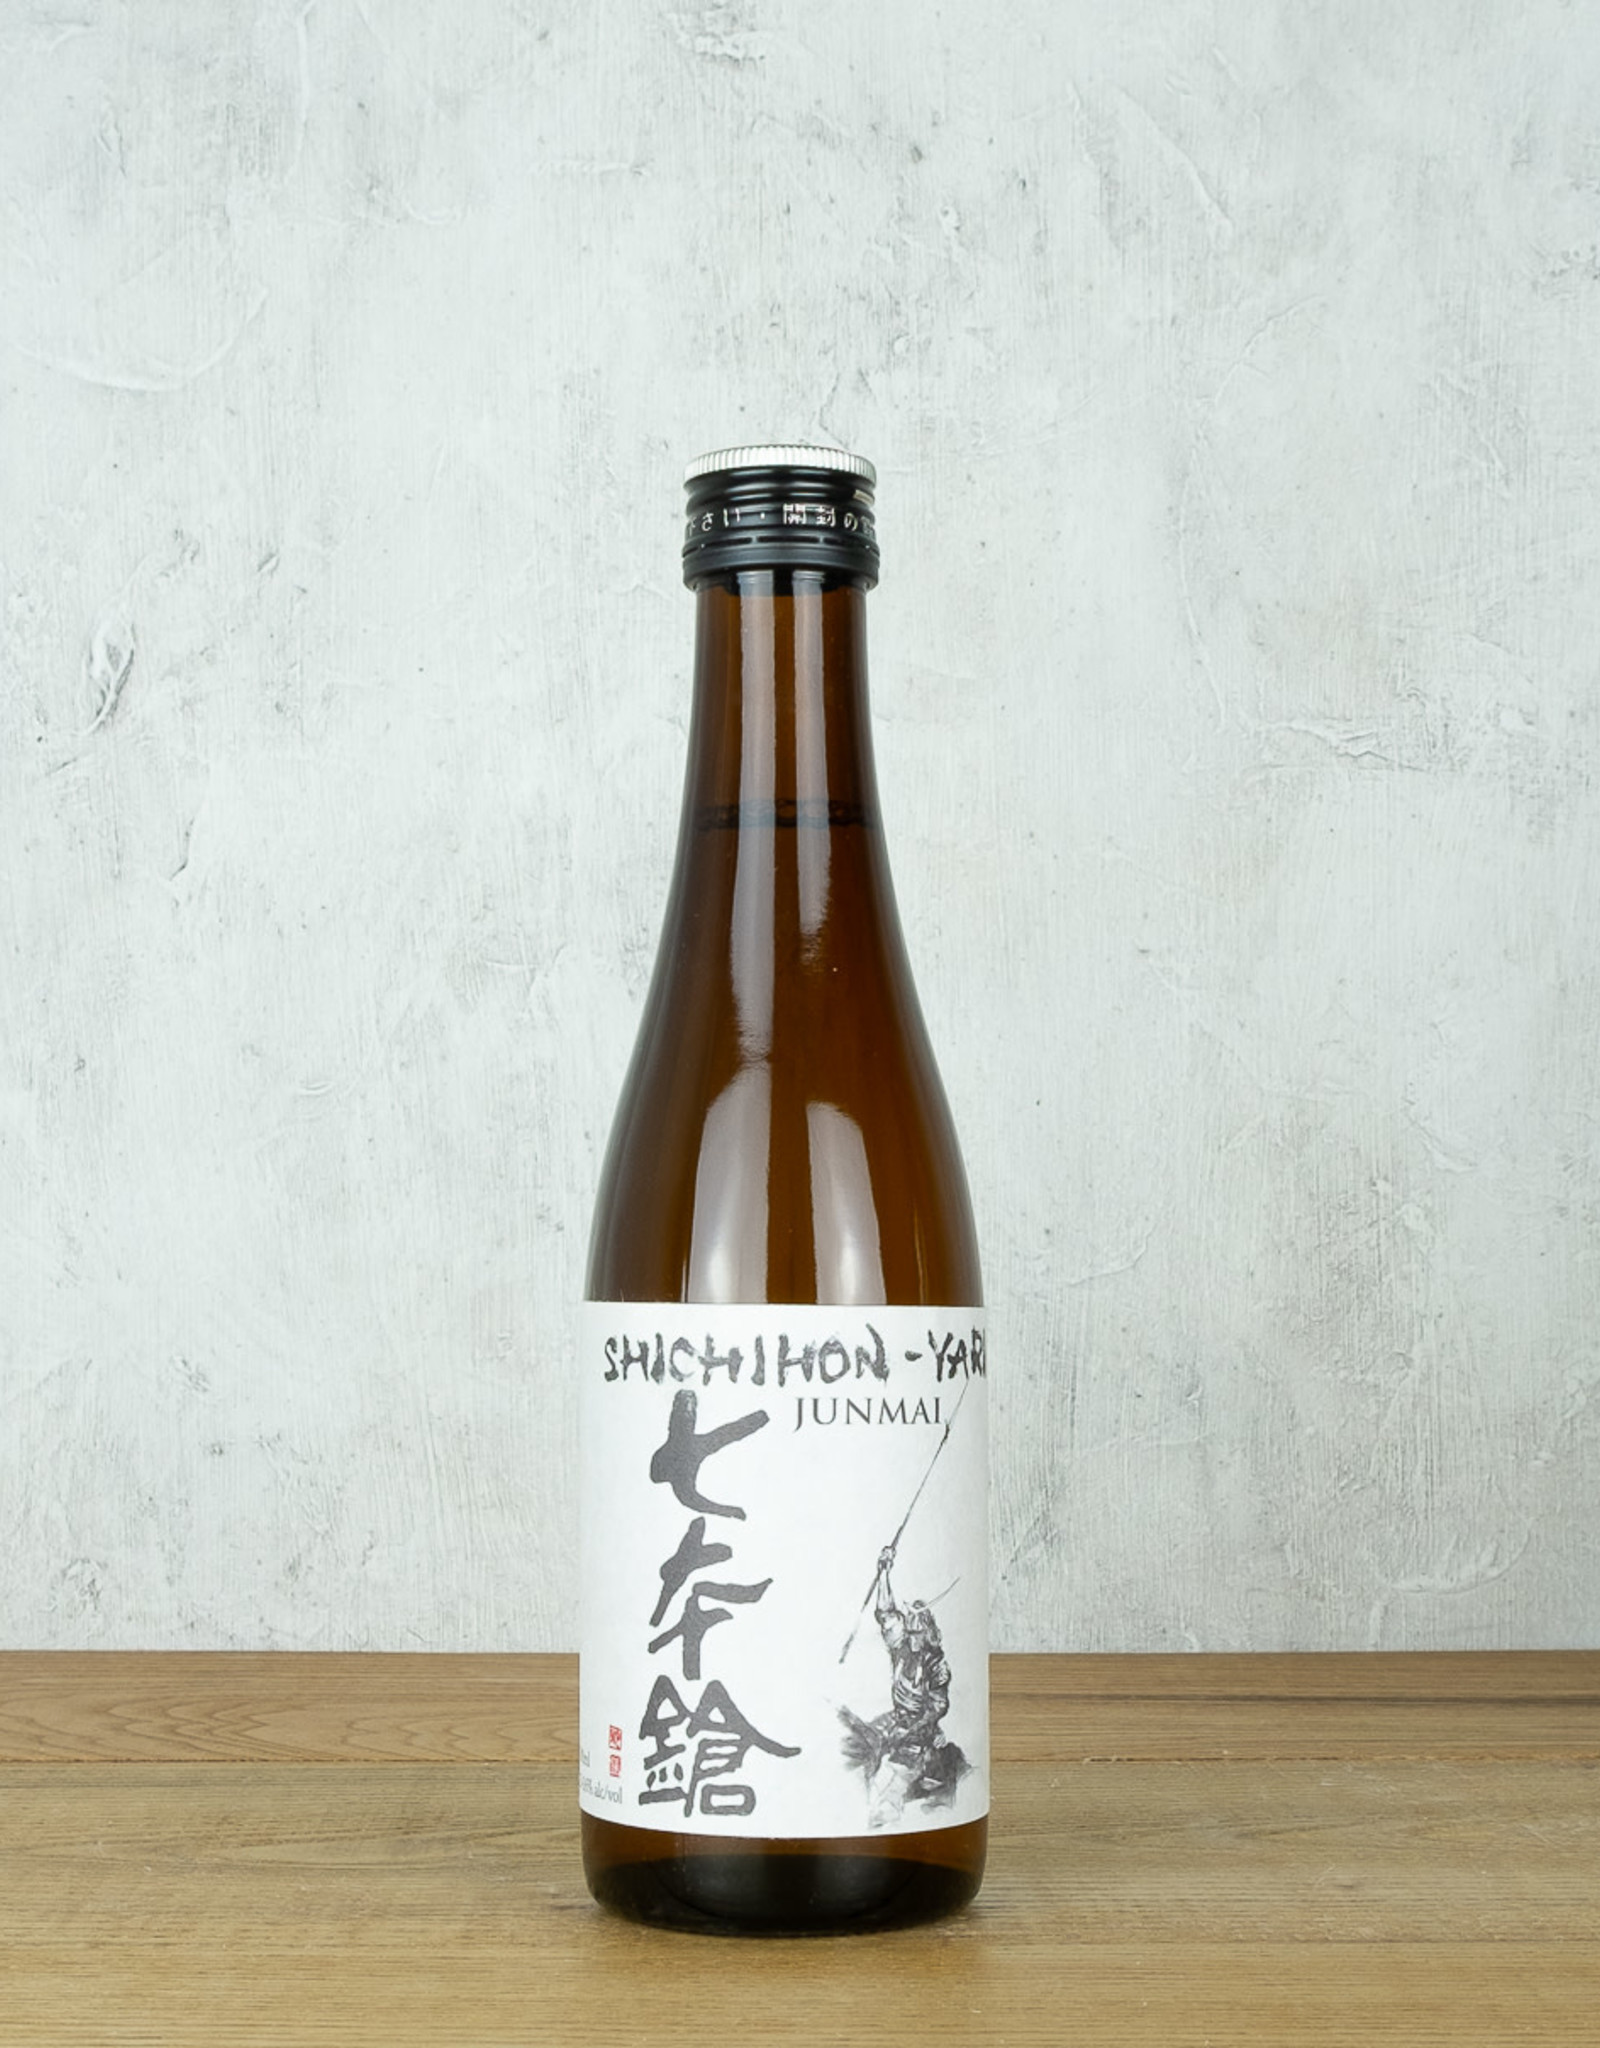 Schichi Hon-Yari Junmai Sake 330ml